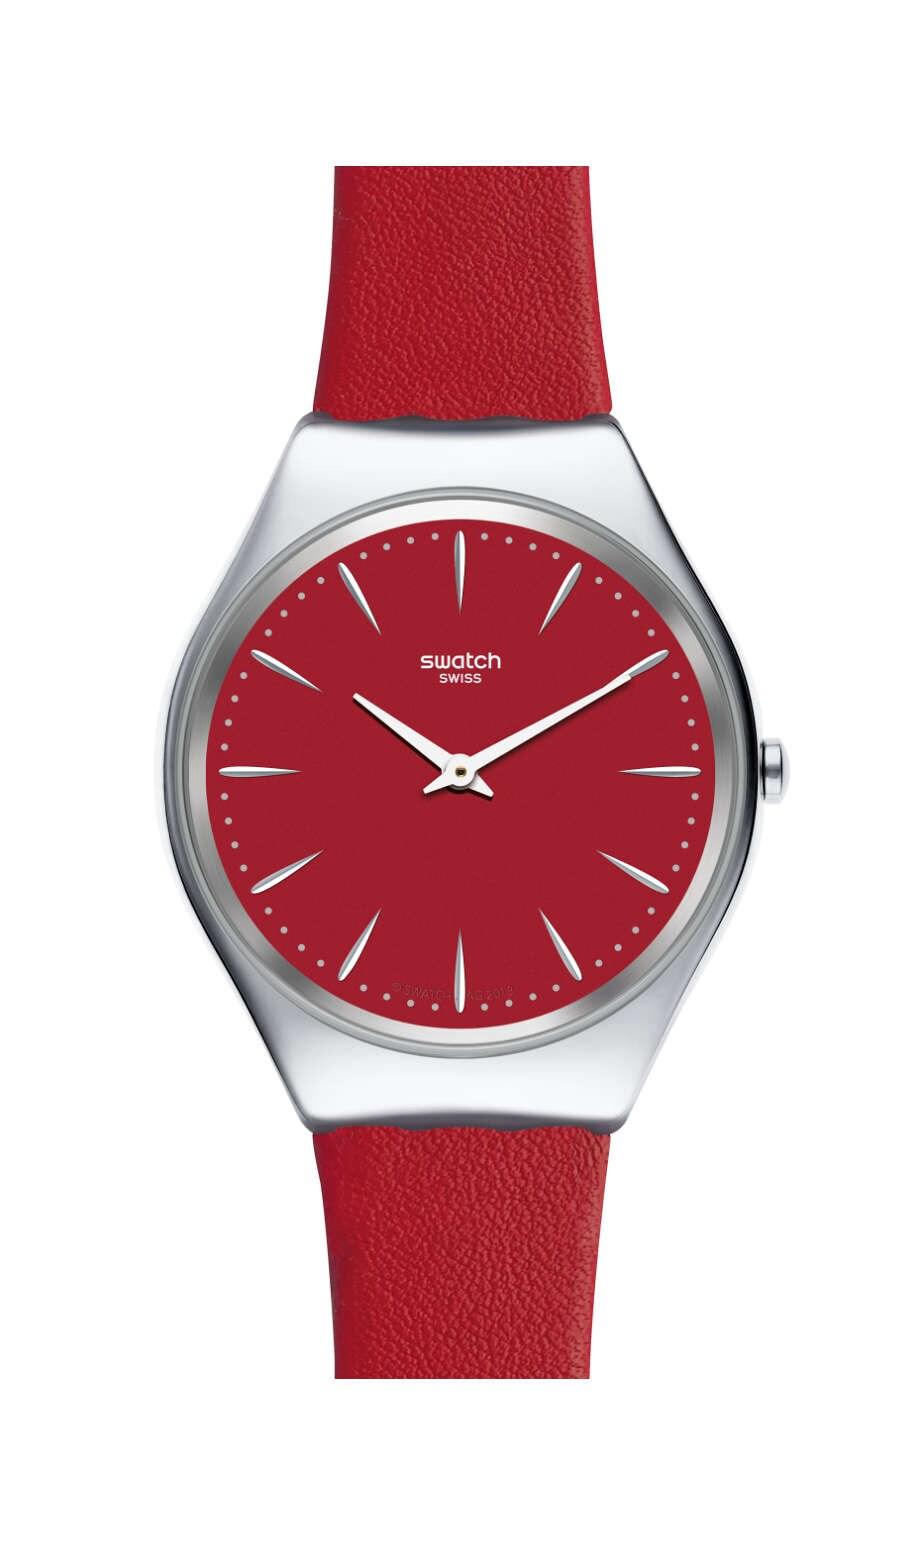 Swatch - SKINROSSA - 1